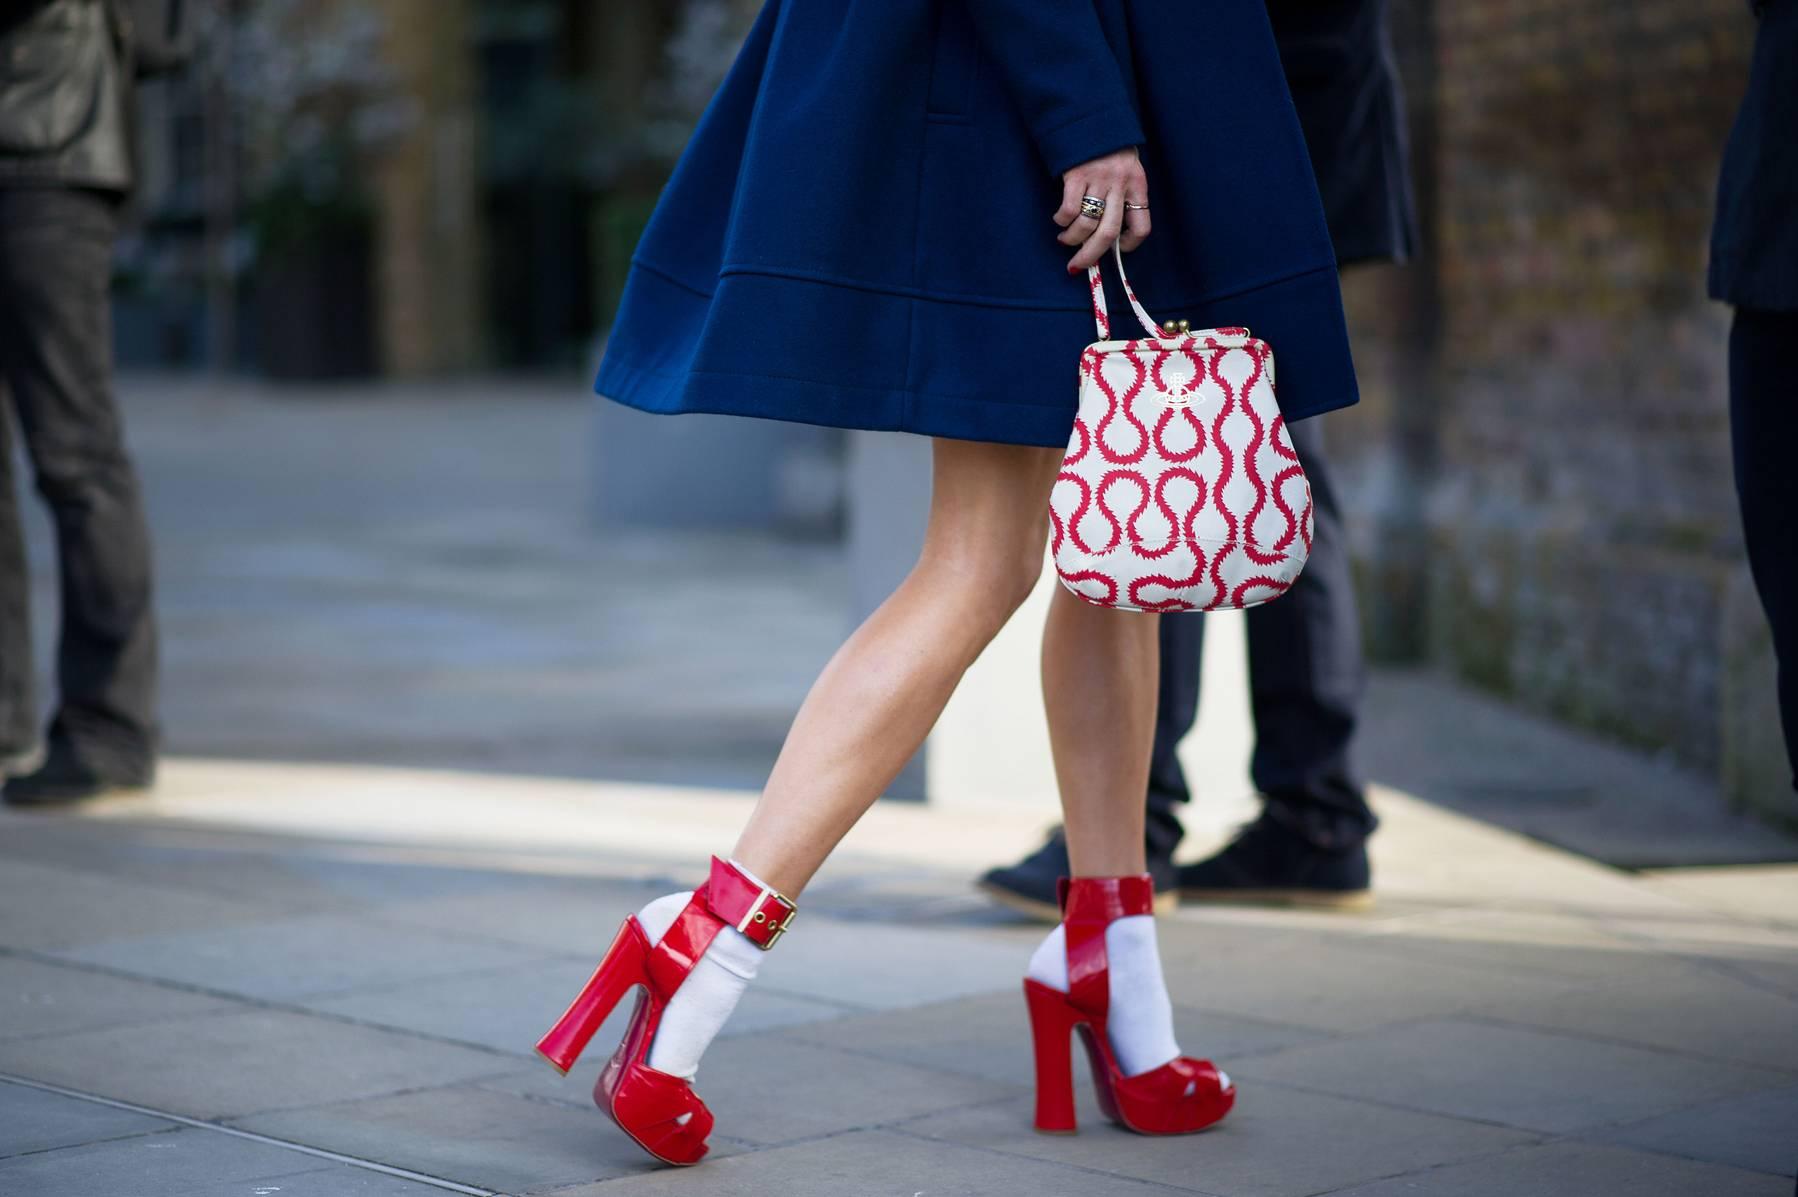 Примерка обуви фото 26 фотография